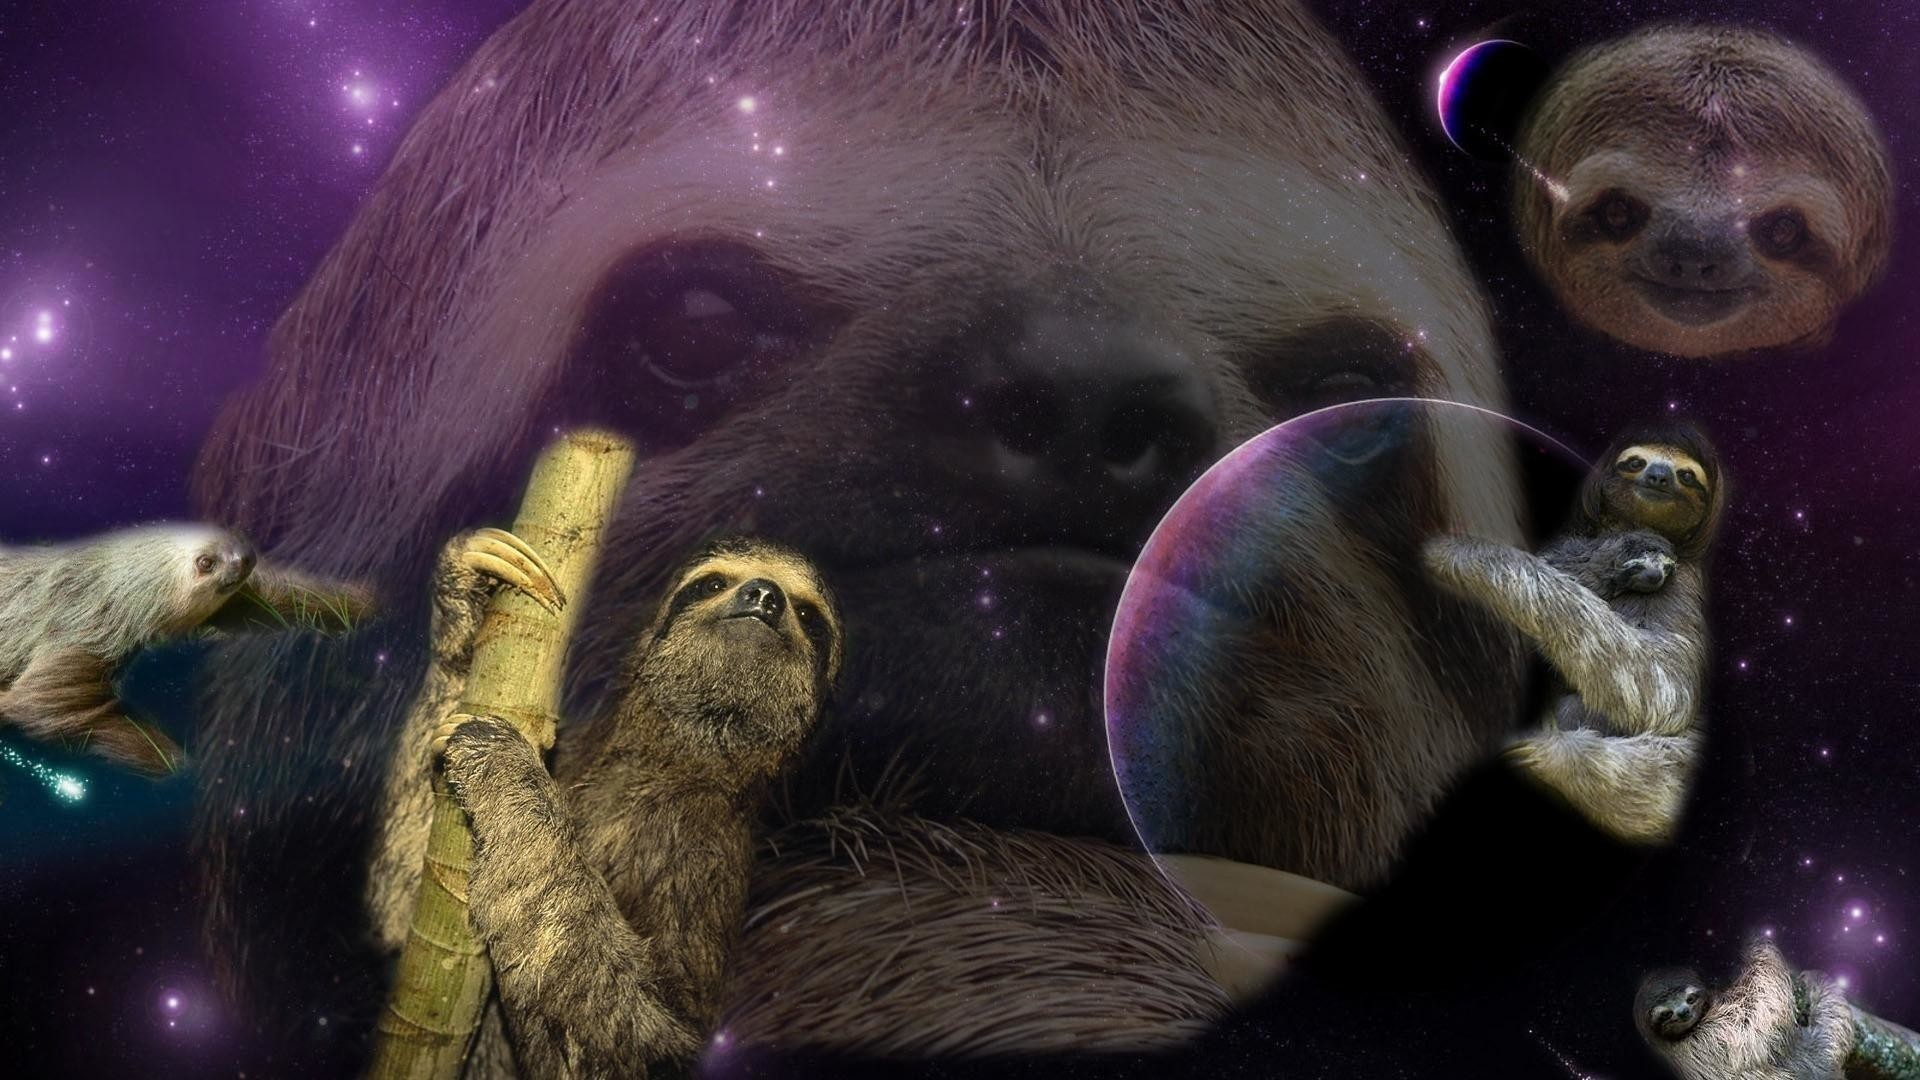 Sloth-Wallpaper-Free-Download